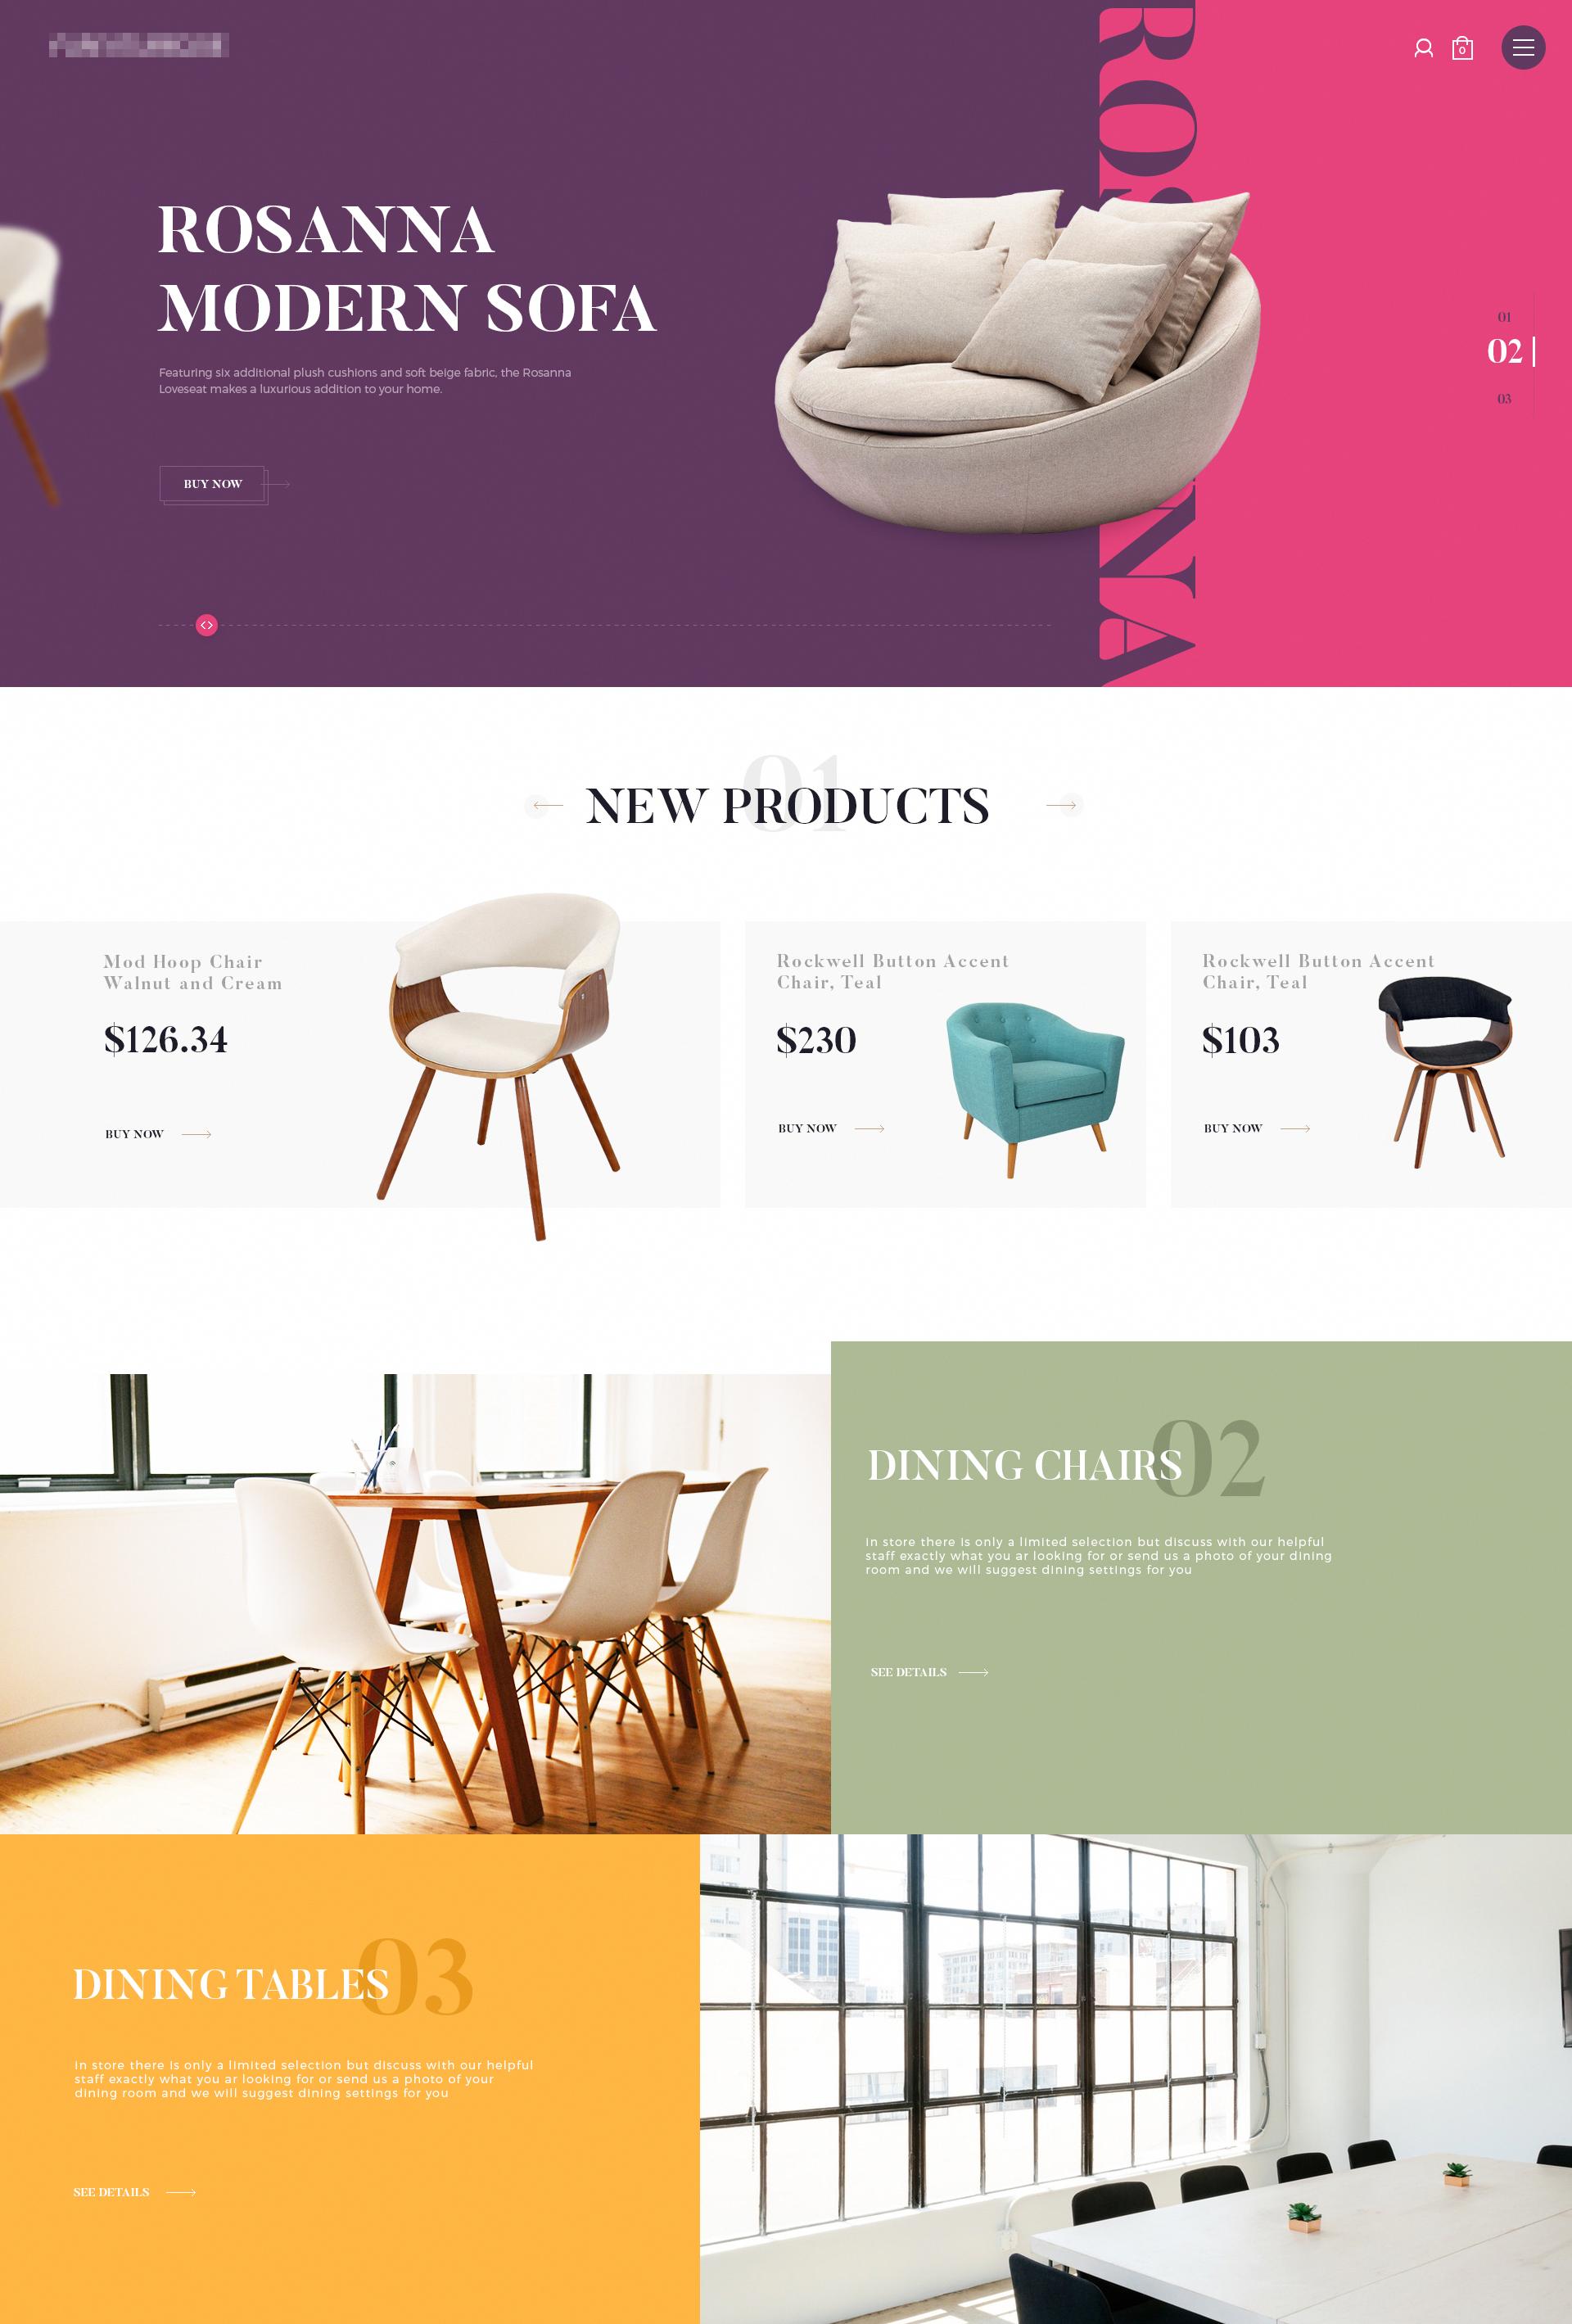 Https dribbble com shots 3217885 furniture website